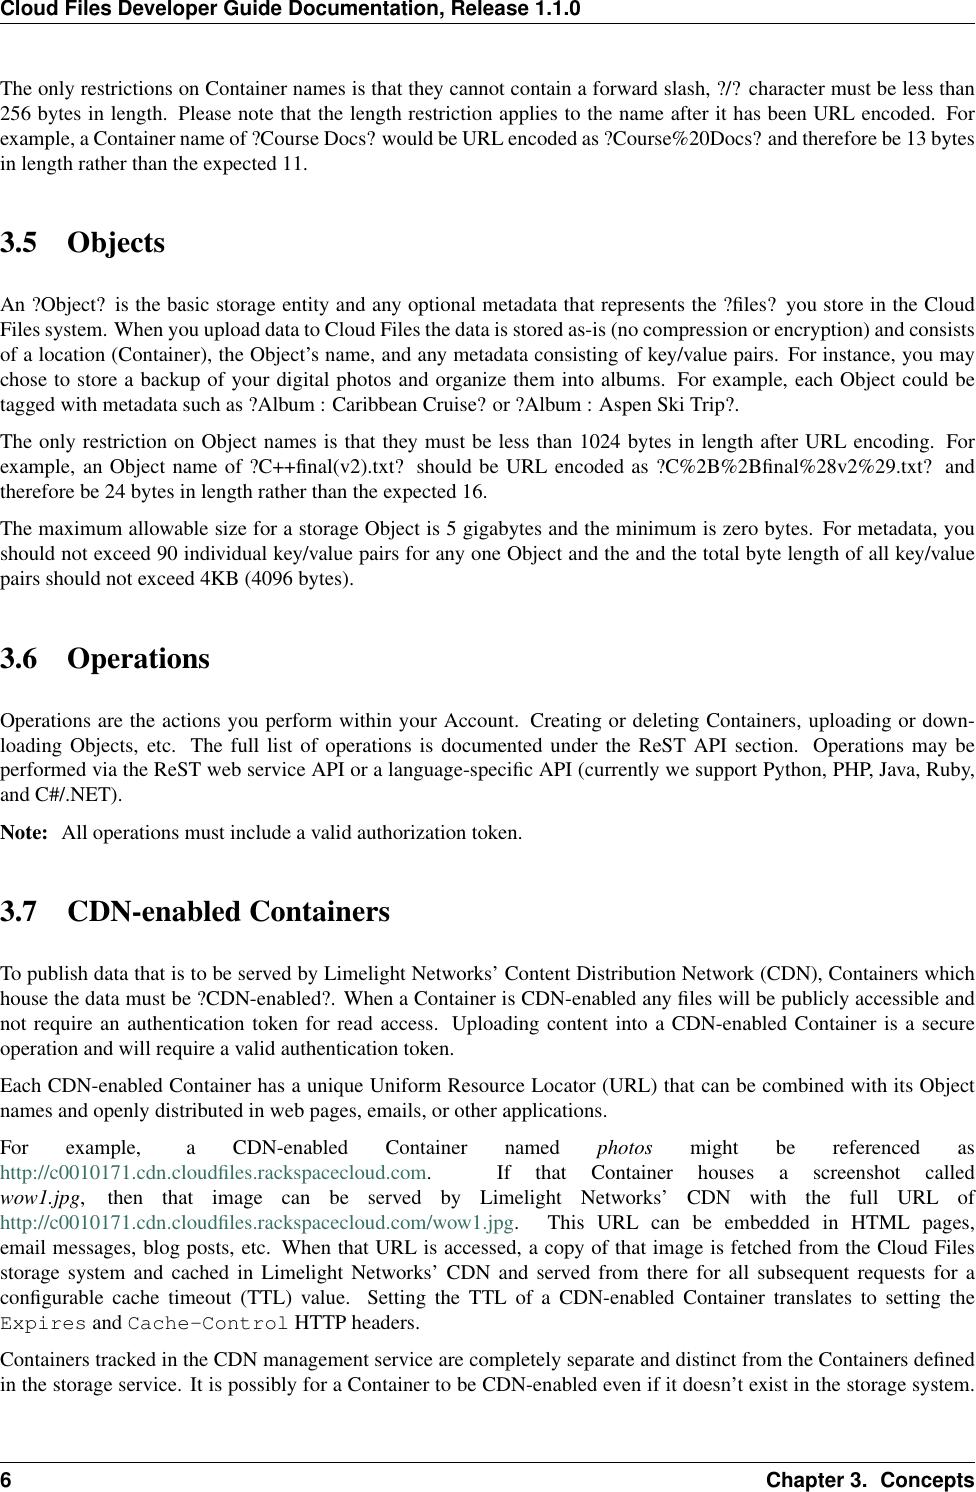 Cloud Files Developer Guide Ation